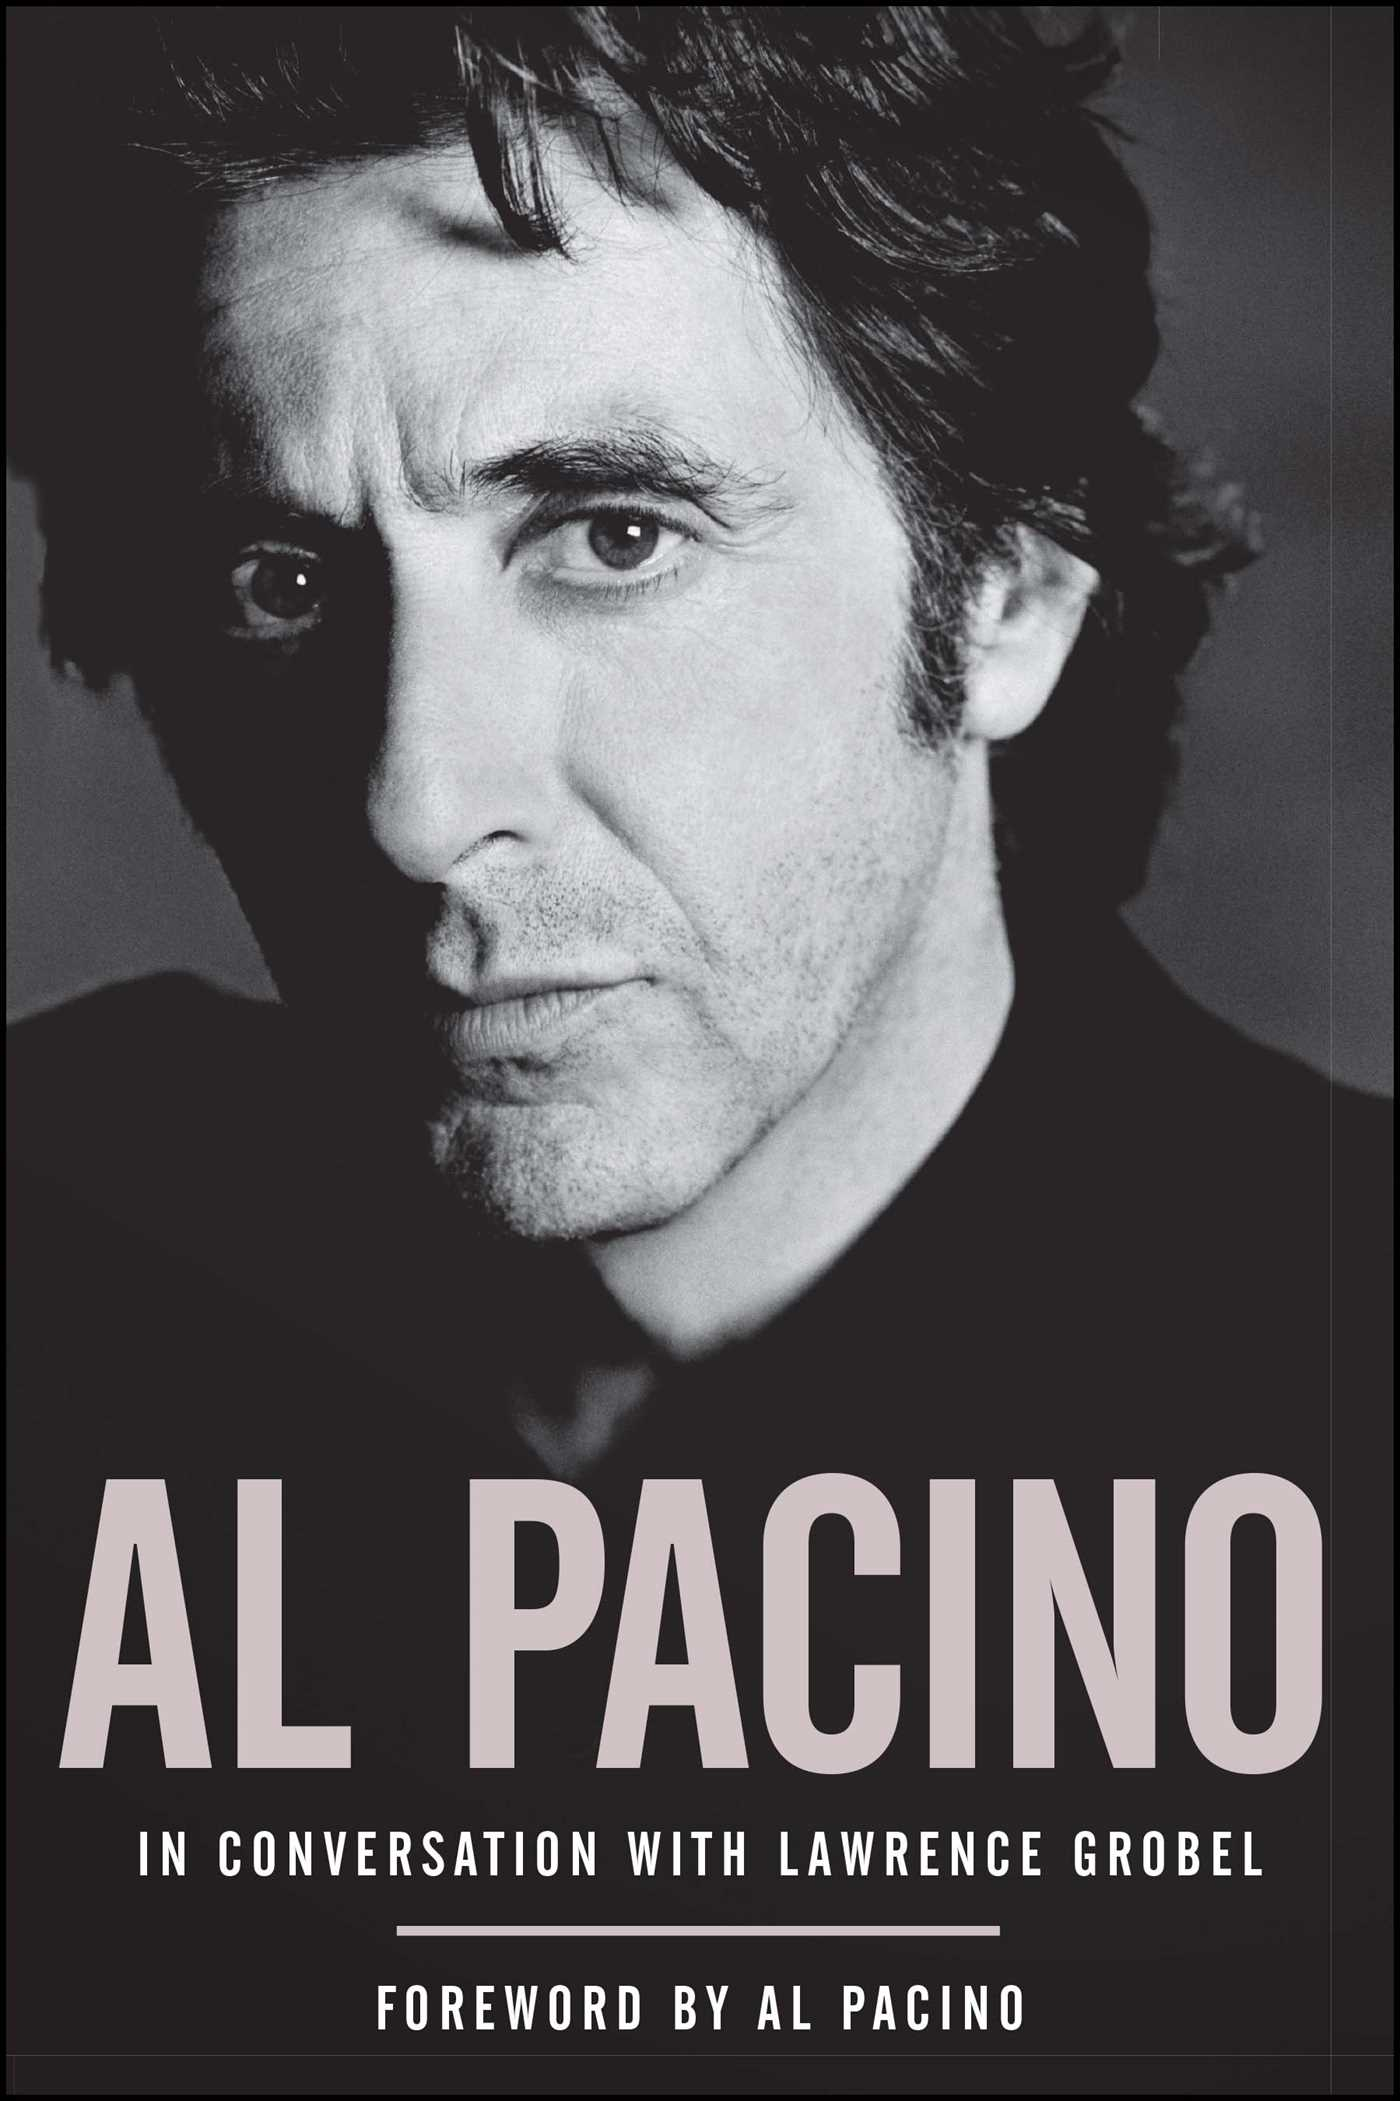 THE GODFATHER MOVIE POSTER Al Pacino Marlon Brando 1218